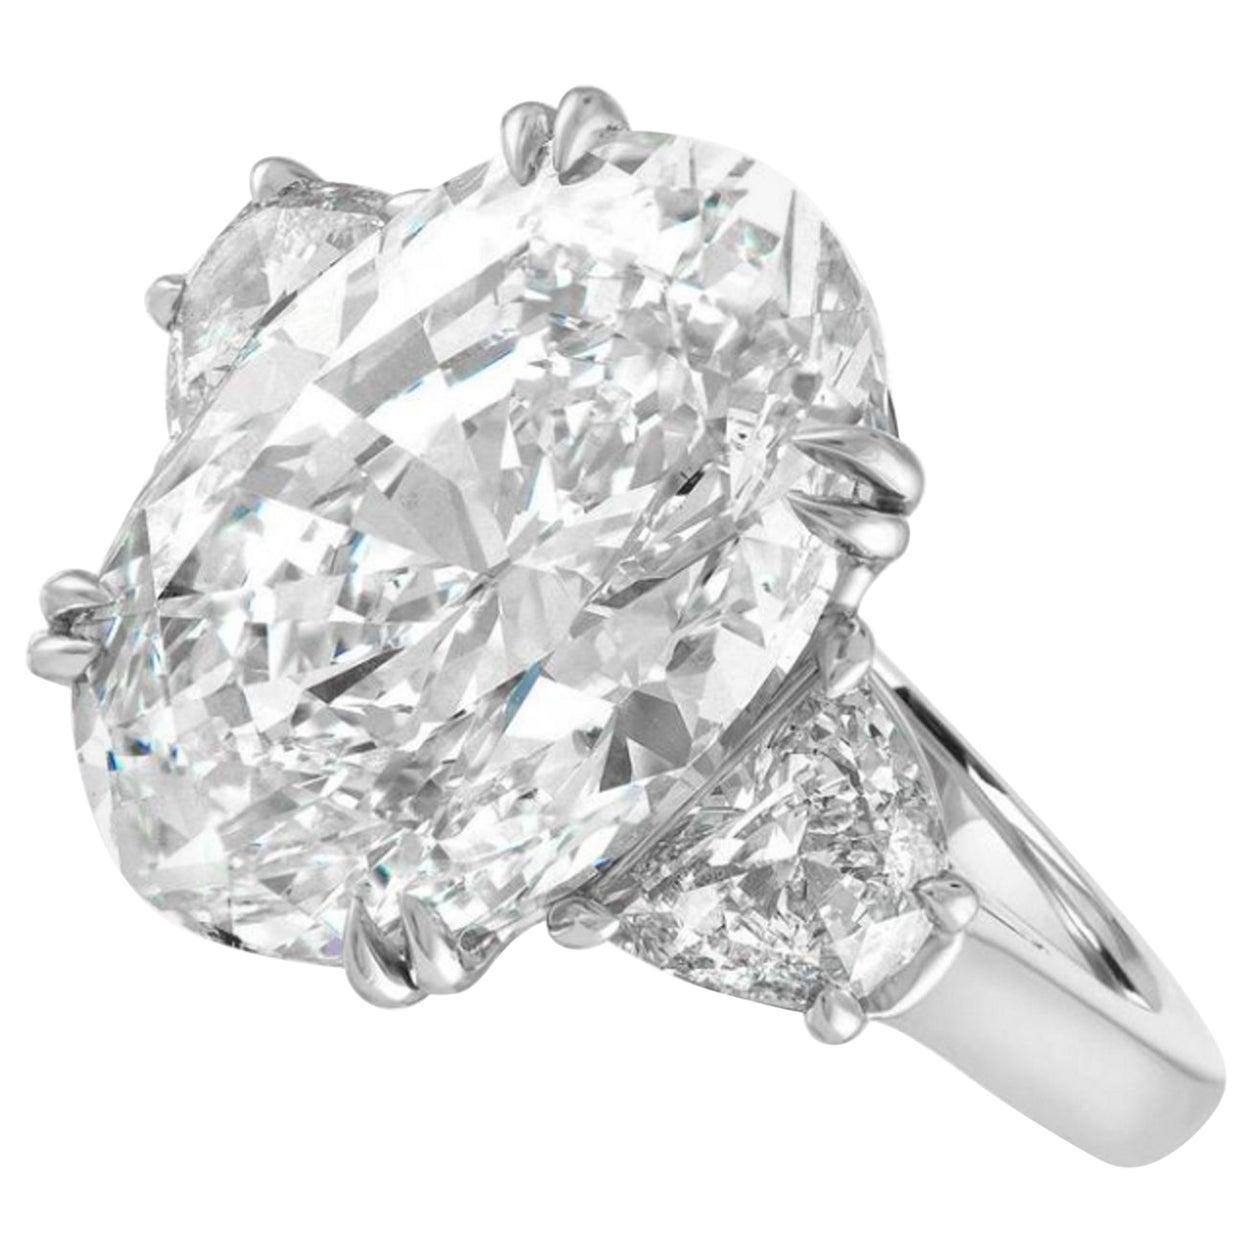 GIA Certified 5.50 Carat Oval Brilliant Cut Diamond Ring VS2